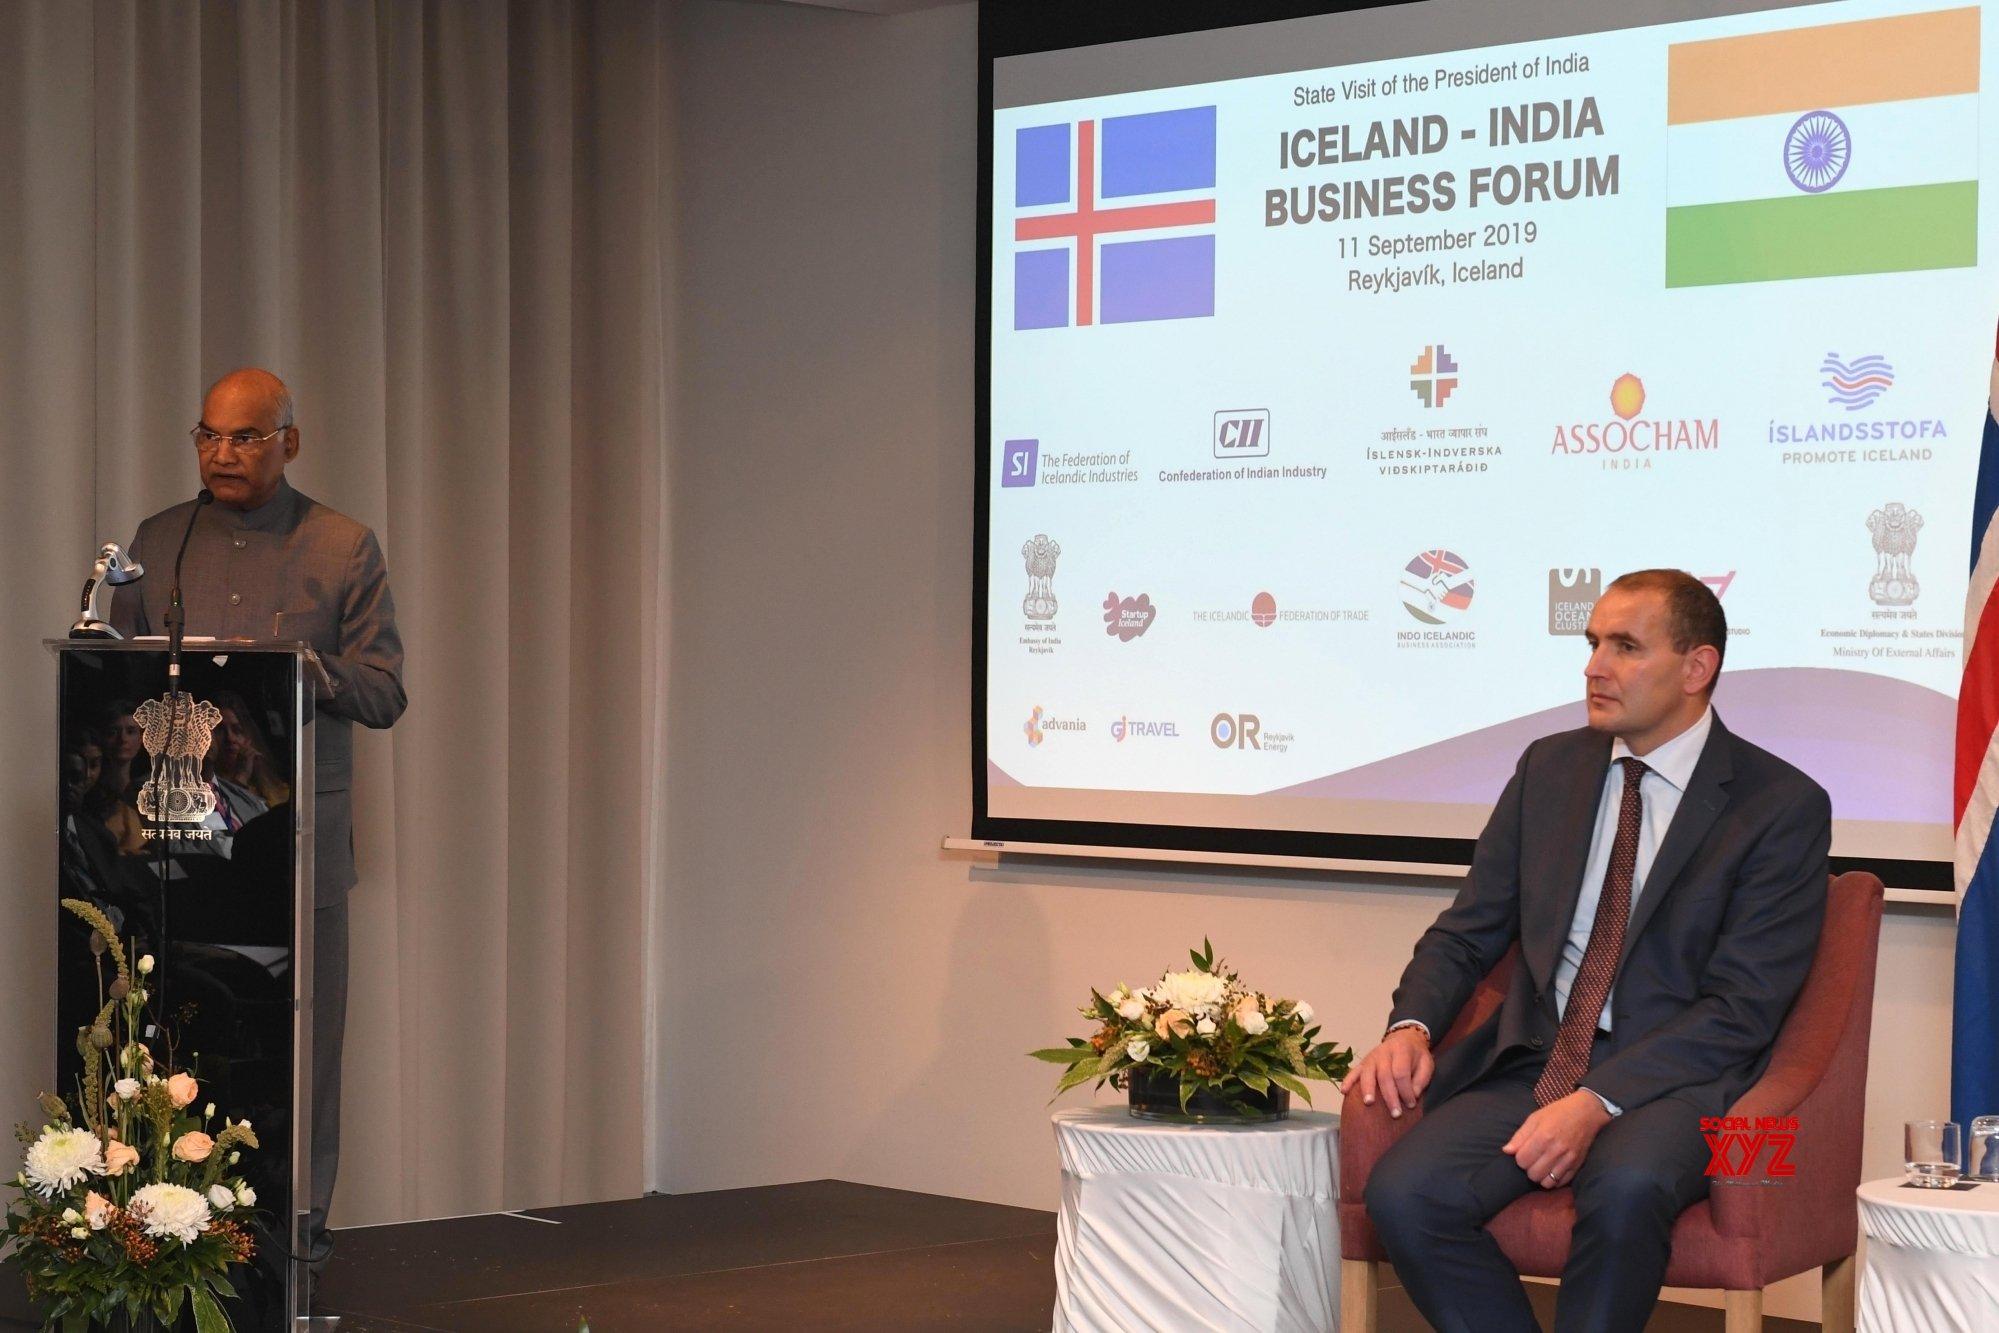 Reykjavik (Iceland): India - Iceland Business Forum #Gallery